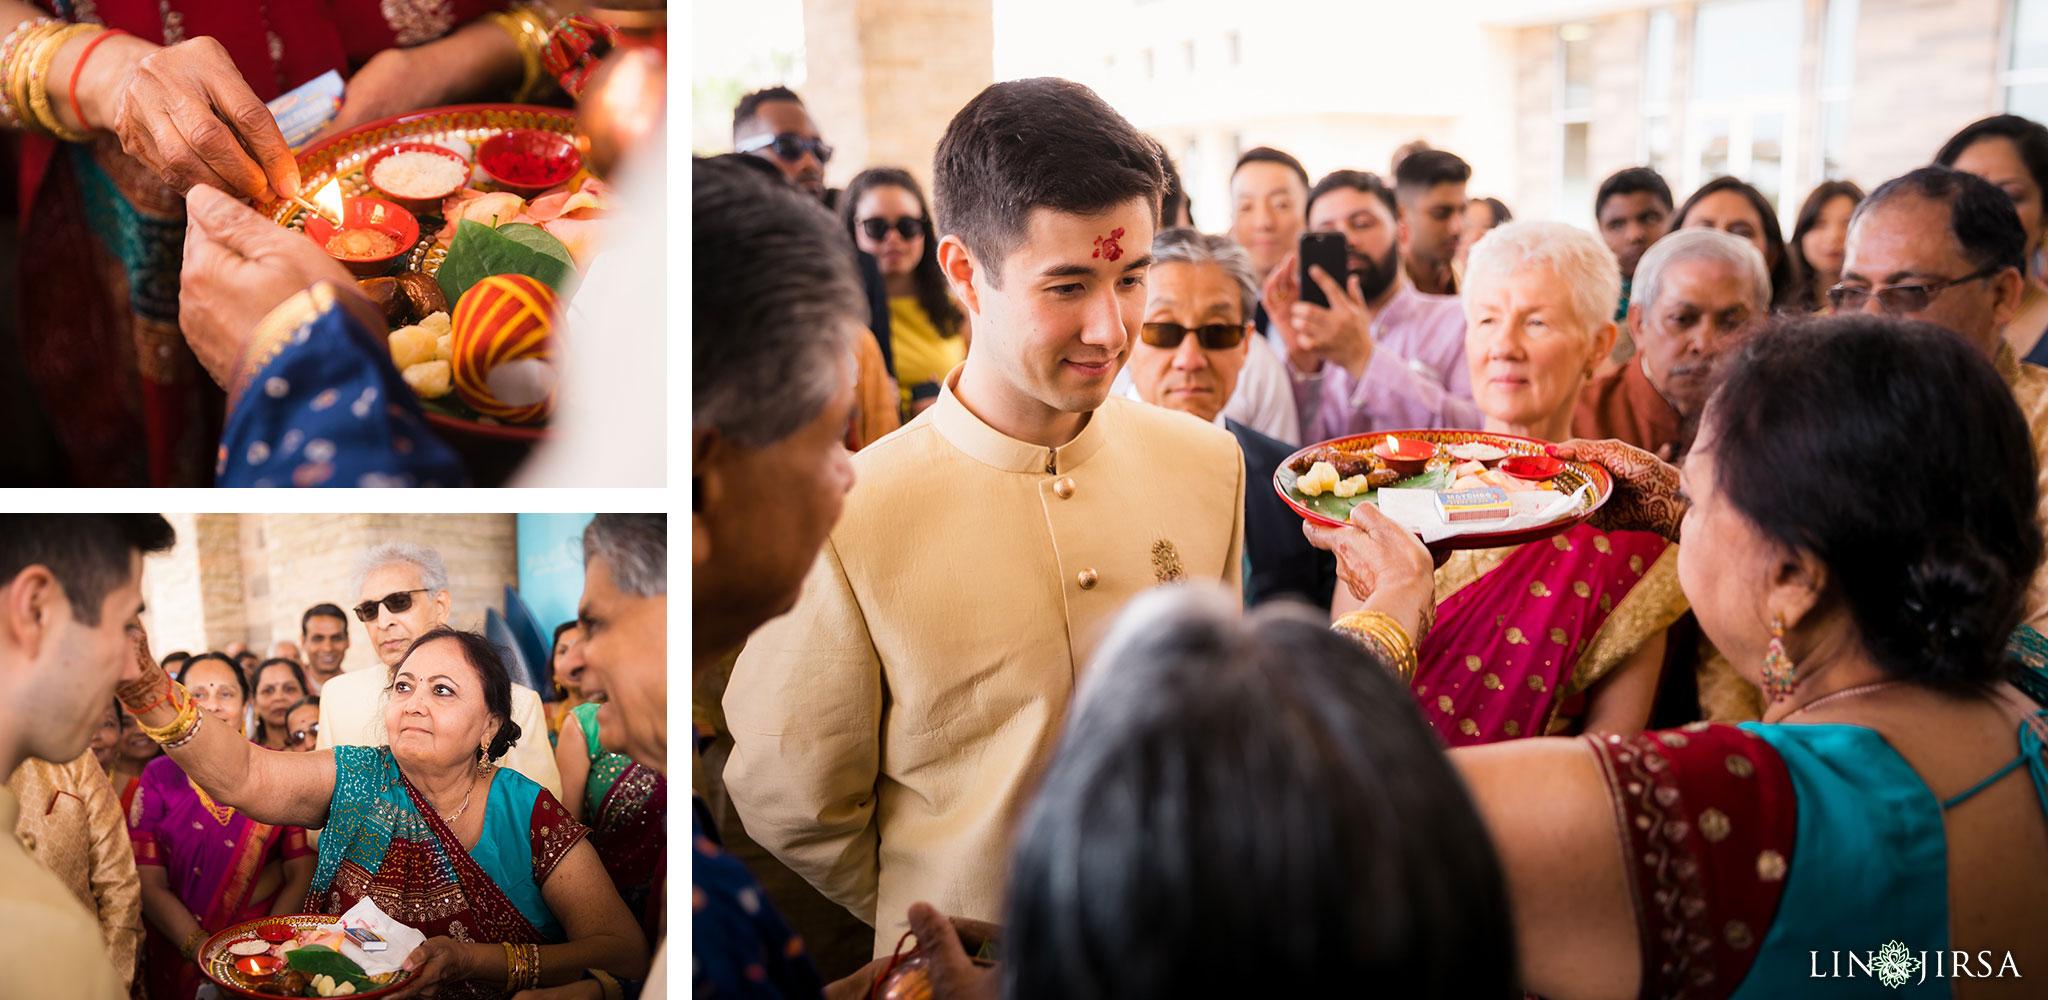 19 pasea hotel and spa huntington beach indian wedding baraat photography